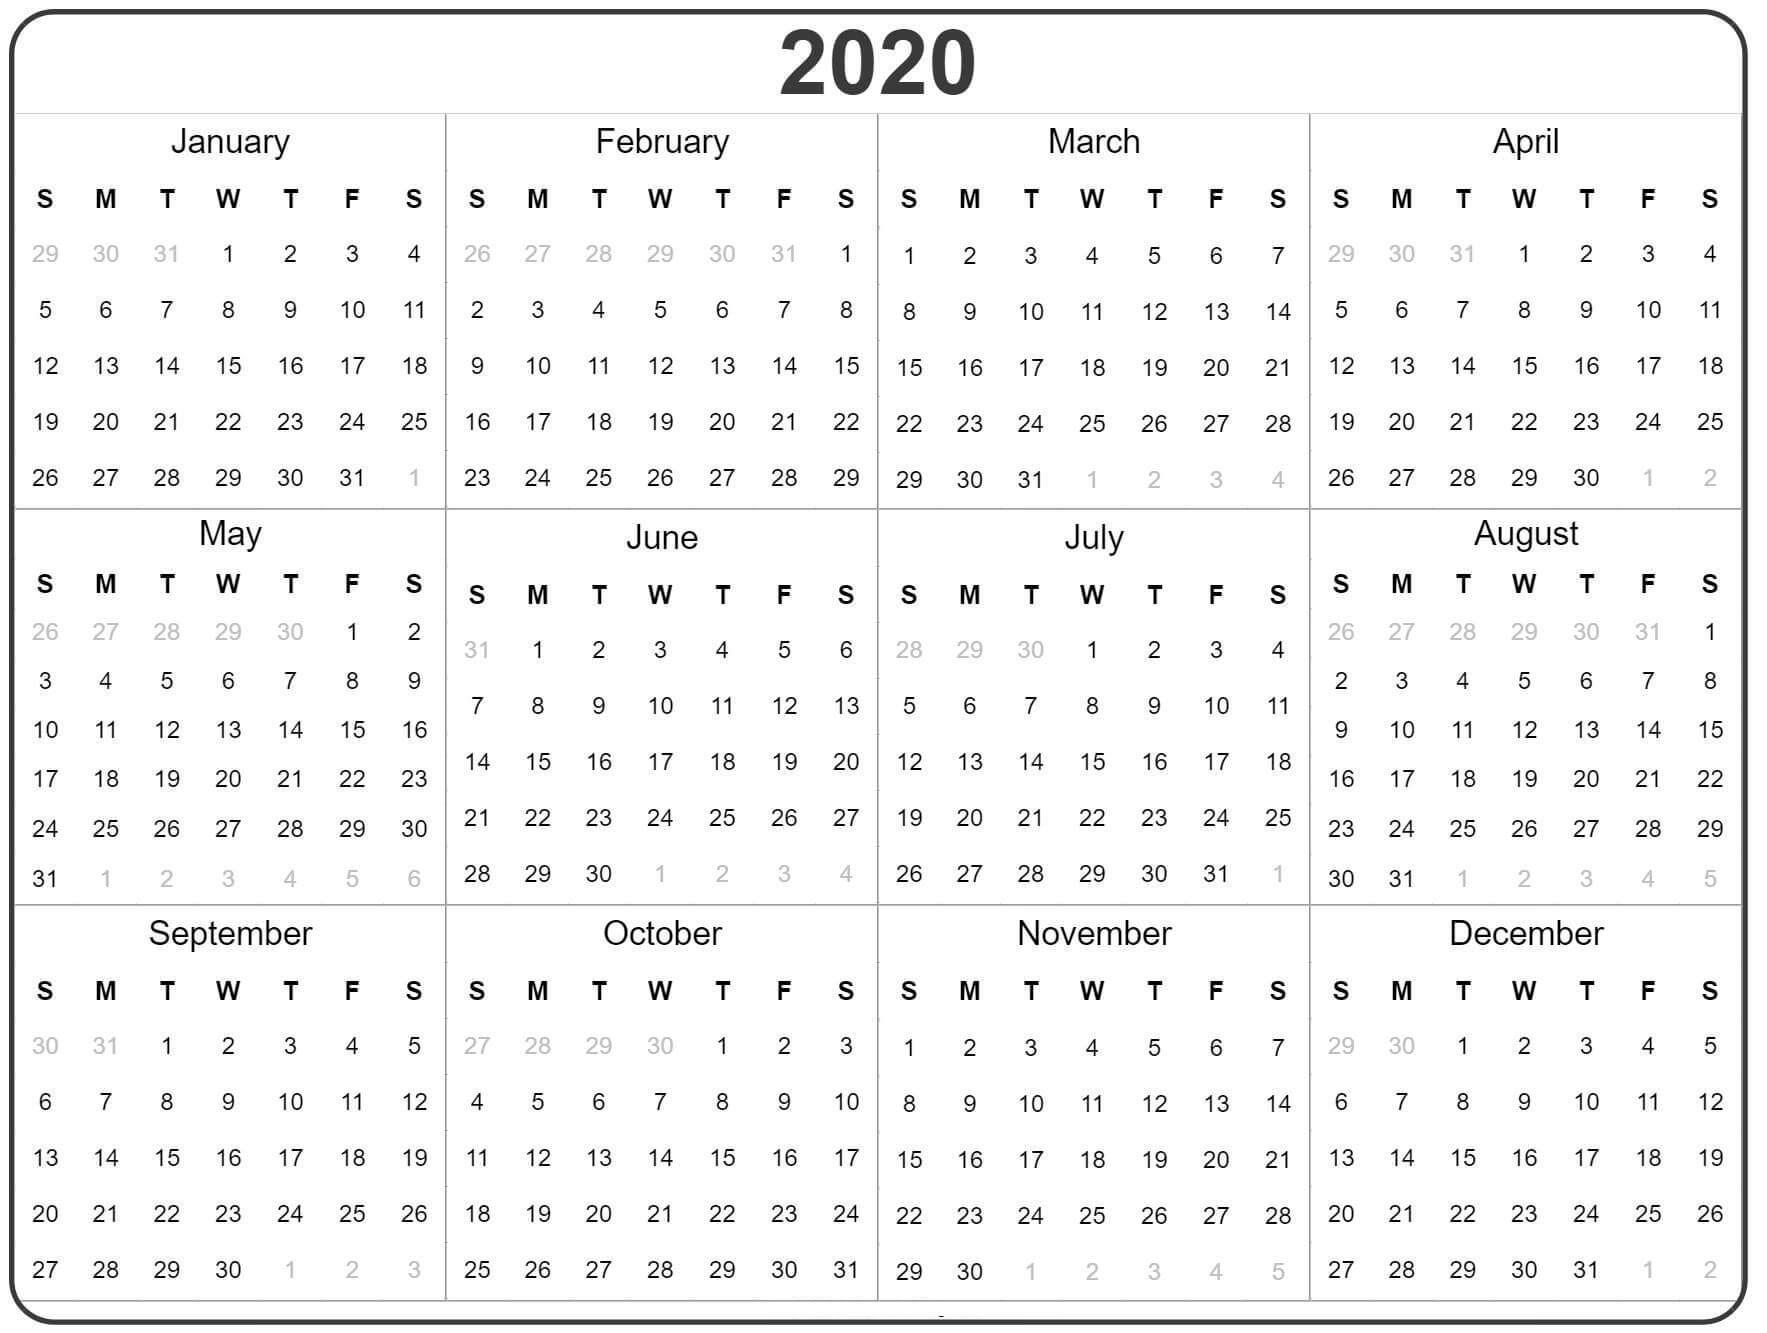 2020 Yearly Calendar